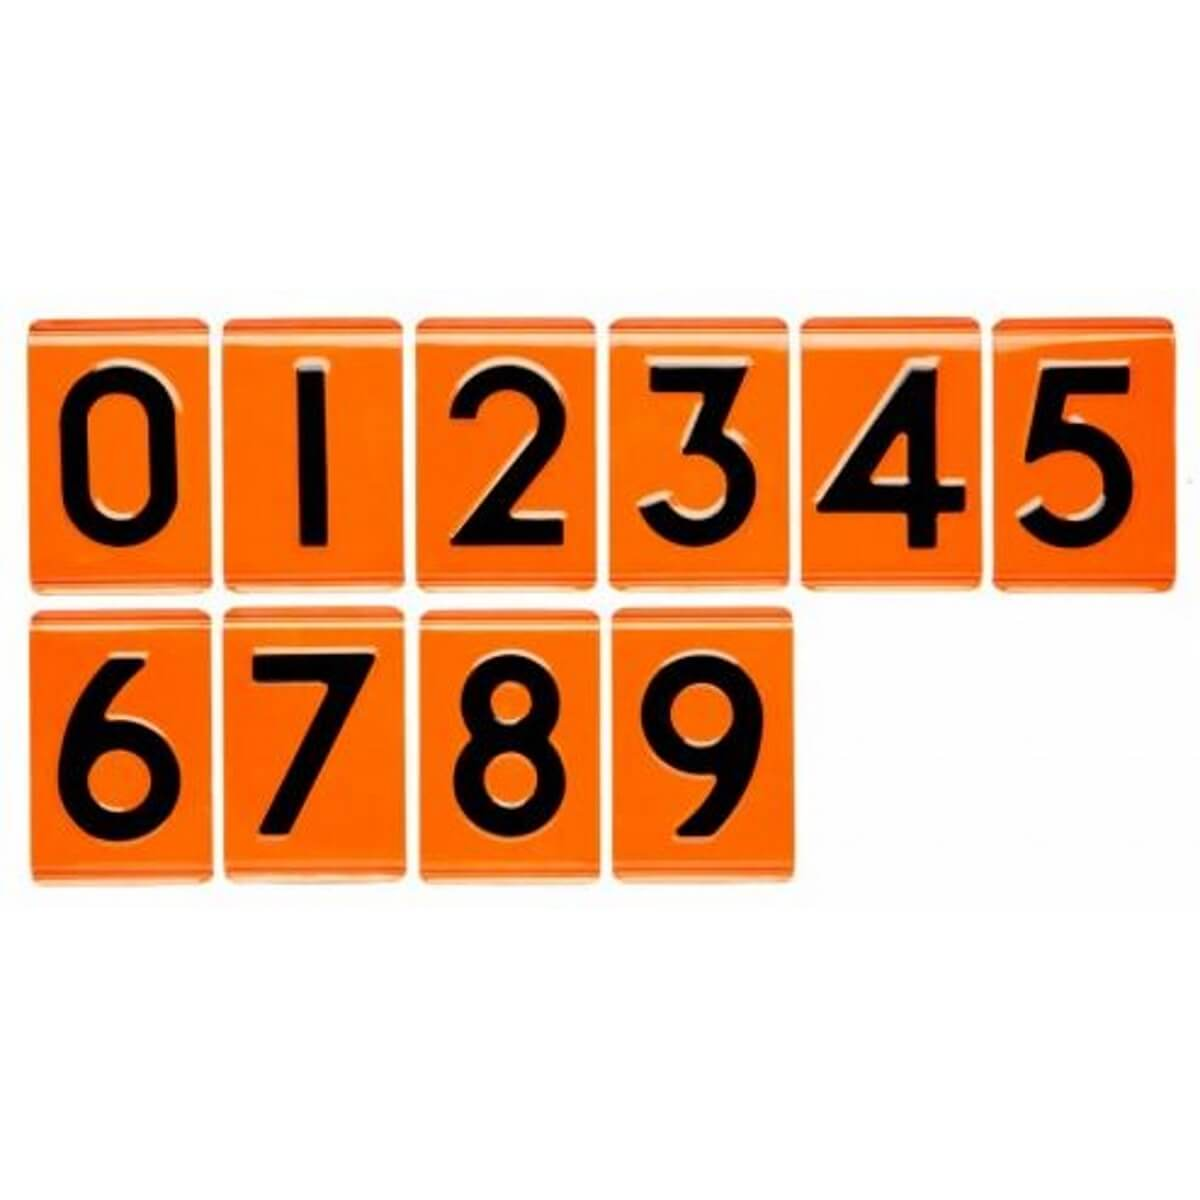 Complete Set of Triplex Kemler Digits